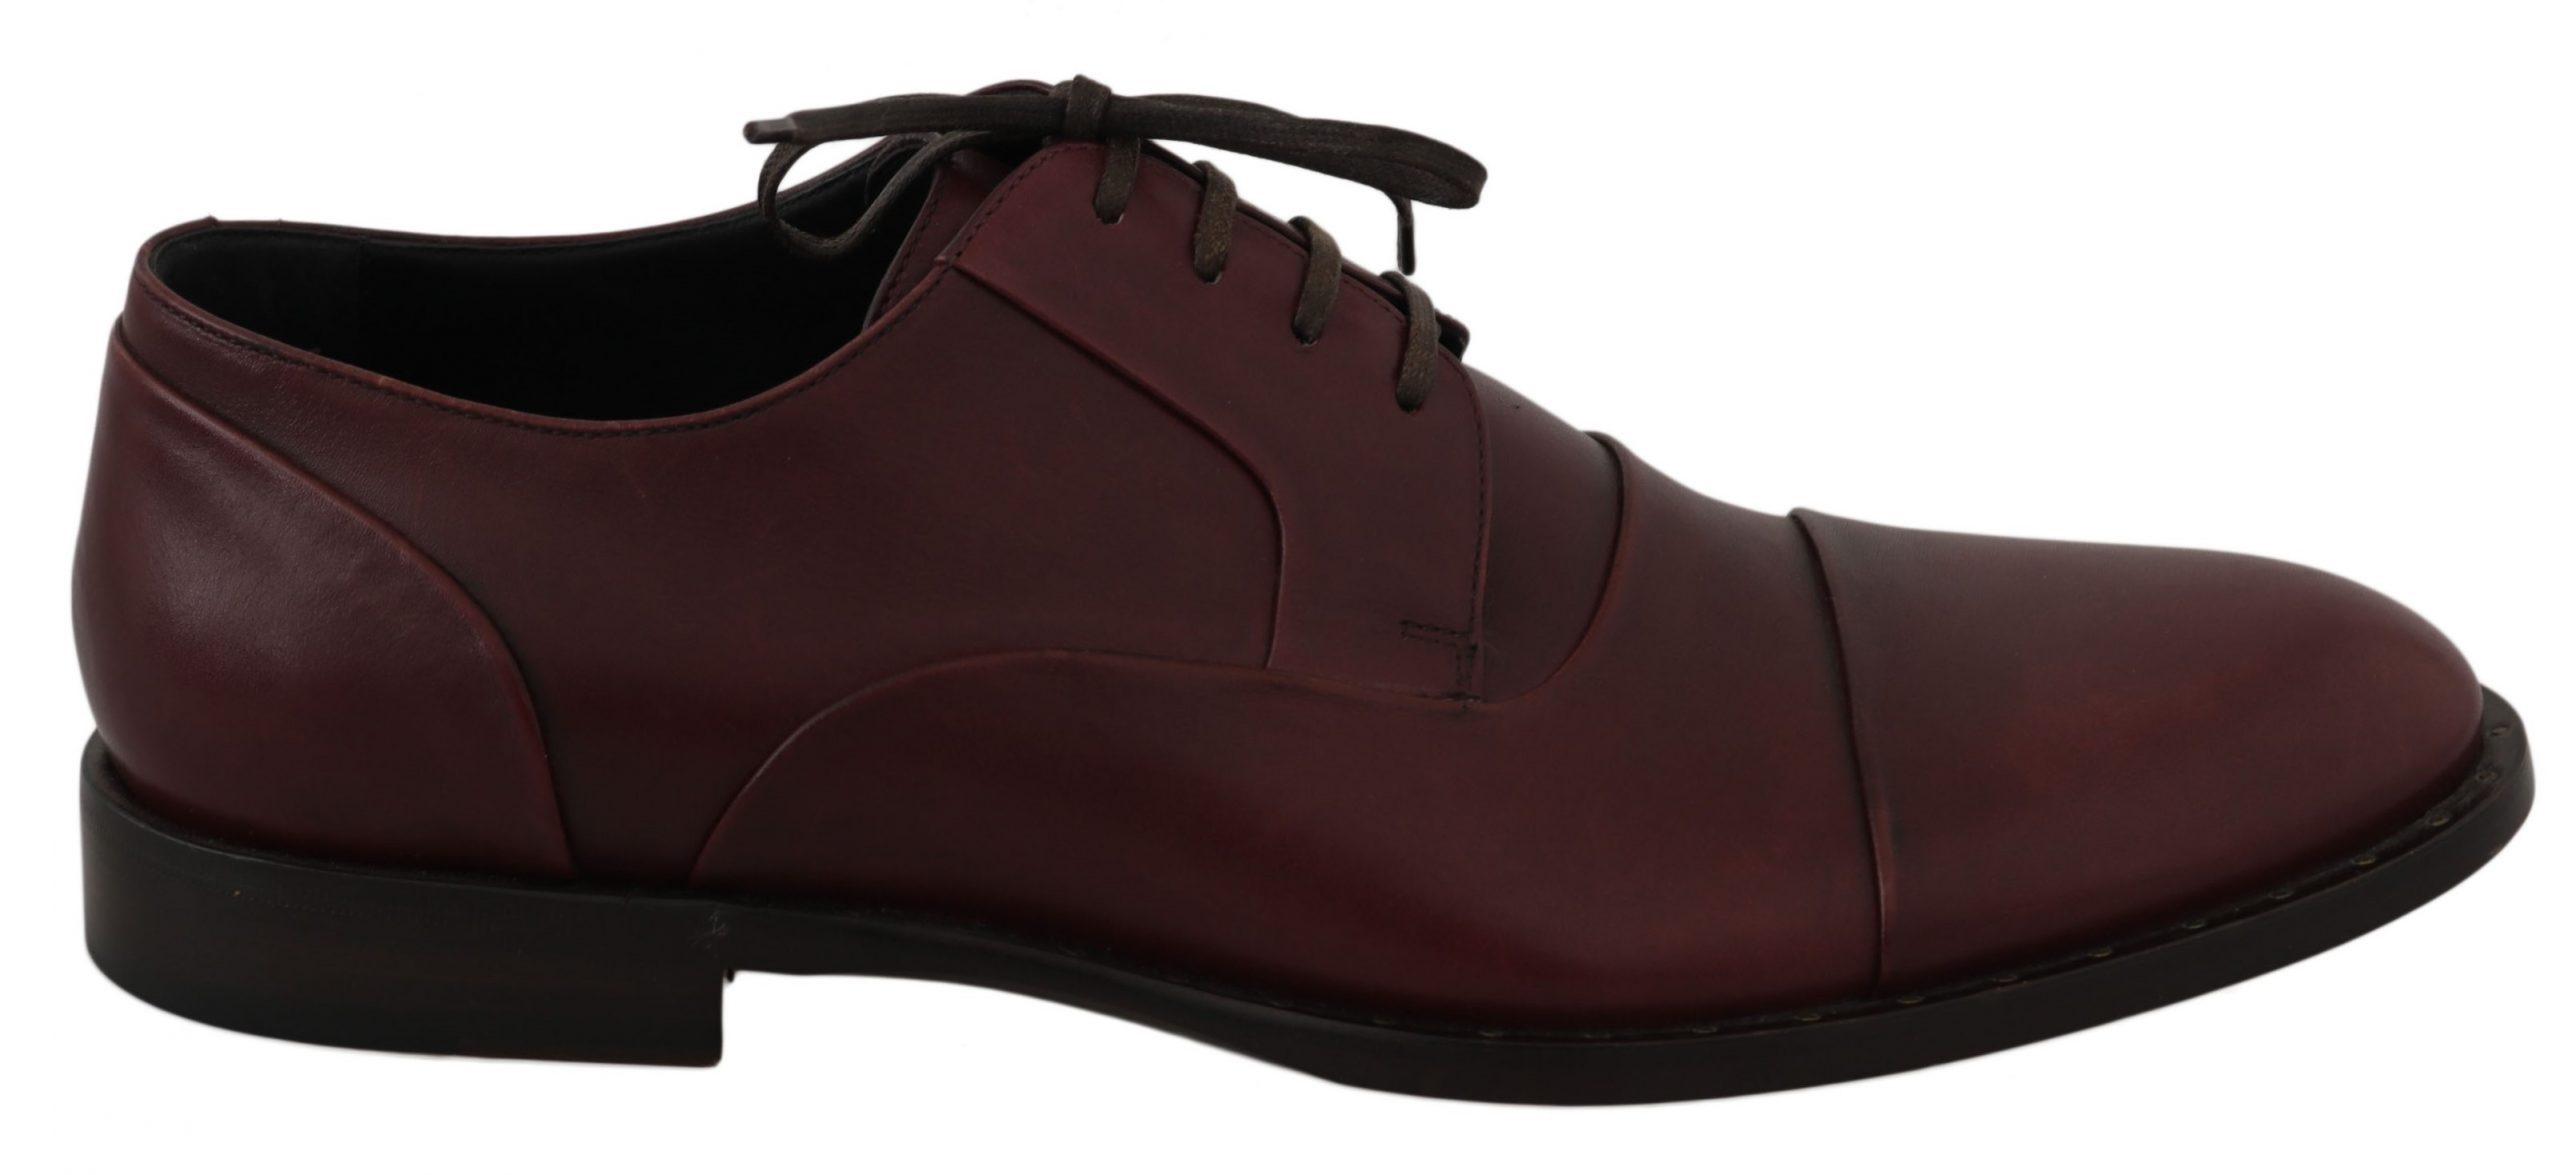 Dolce & Gabbana Men's Leather Formal Oxford Shoe Bordeaux MV2318 - EU39/US6